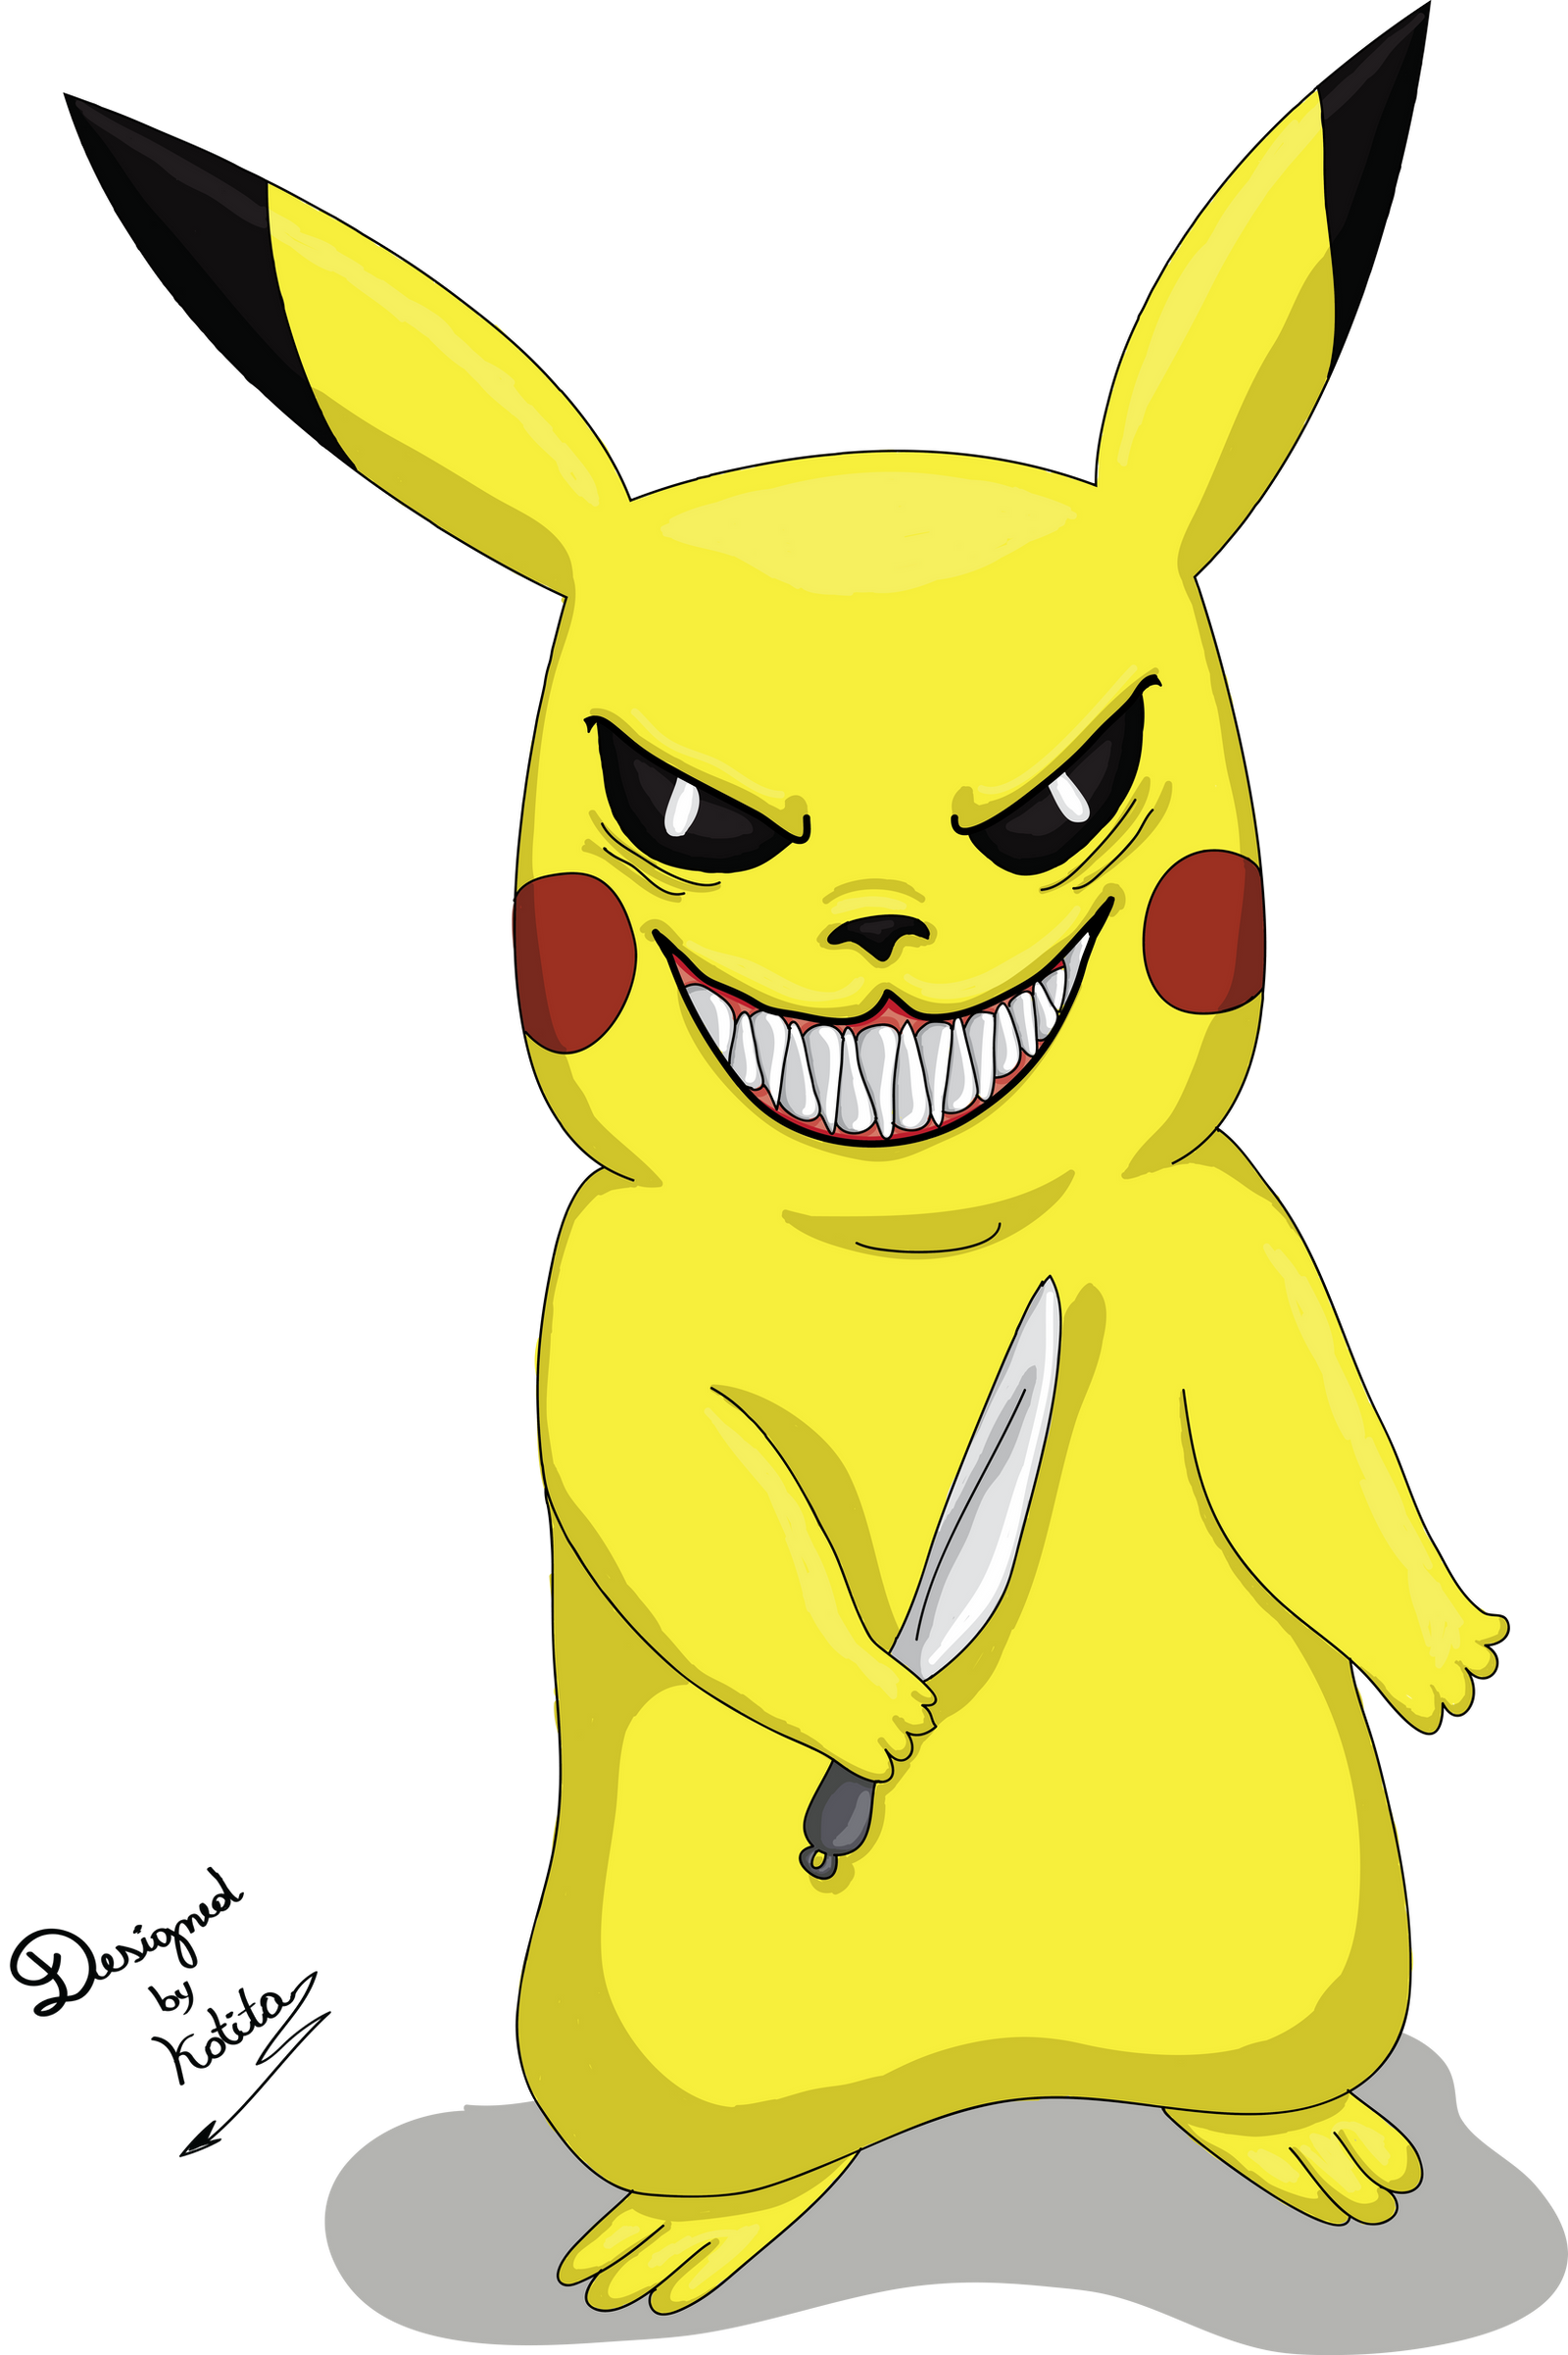 evil pokemon wallpaper - photo #19